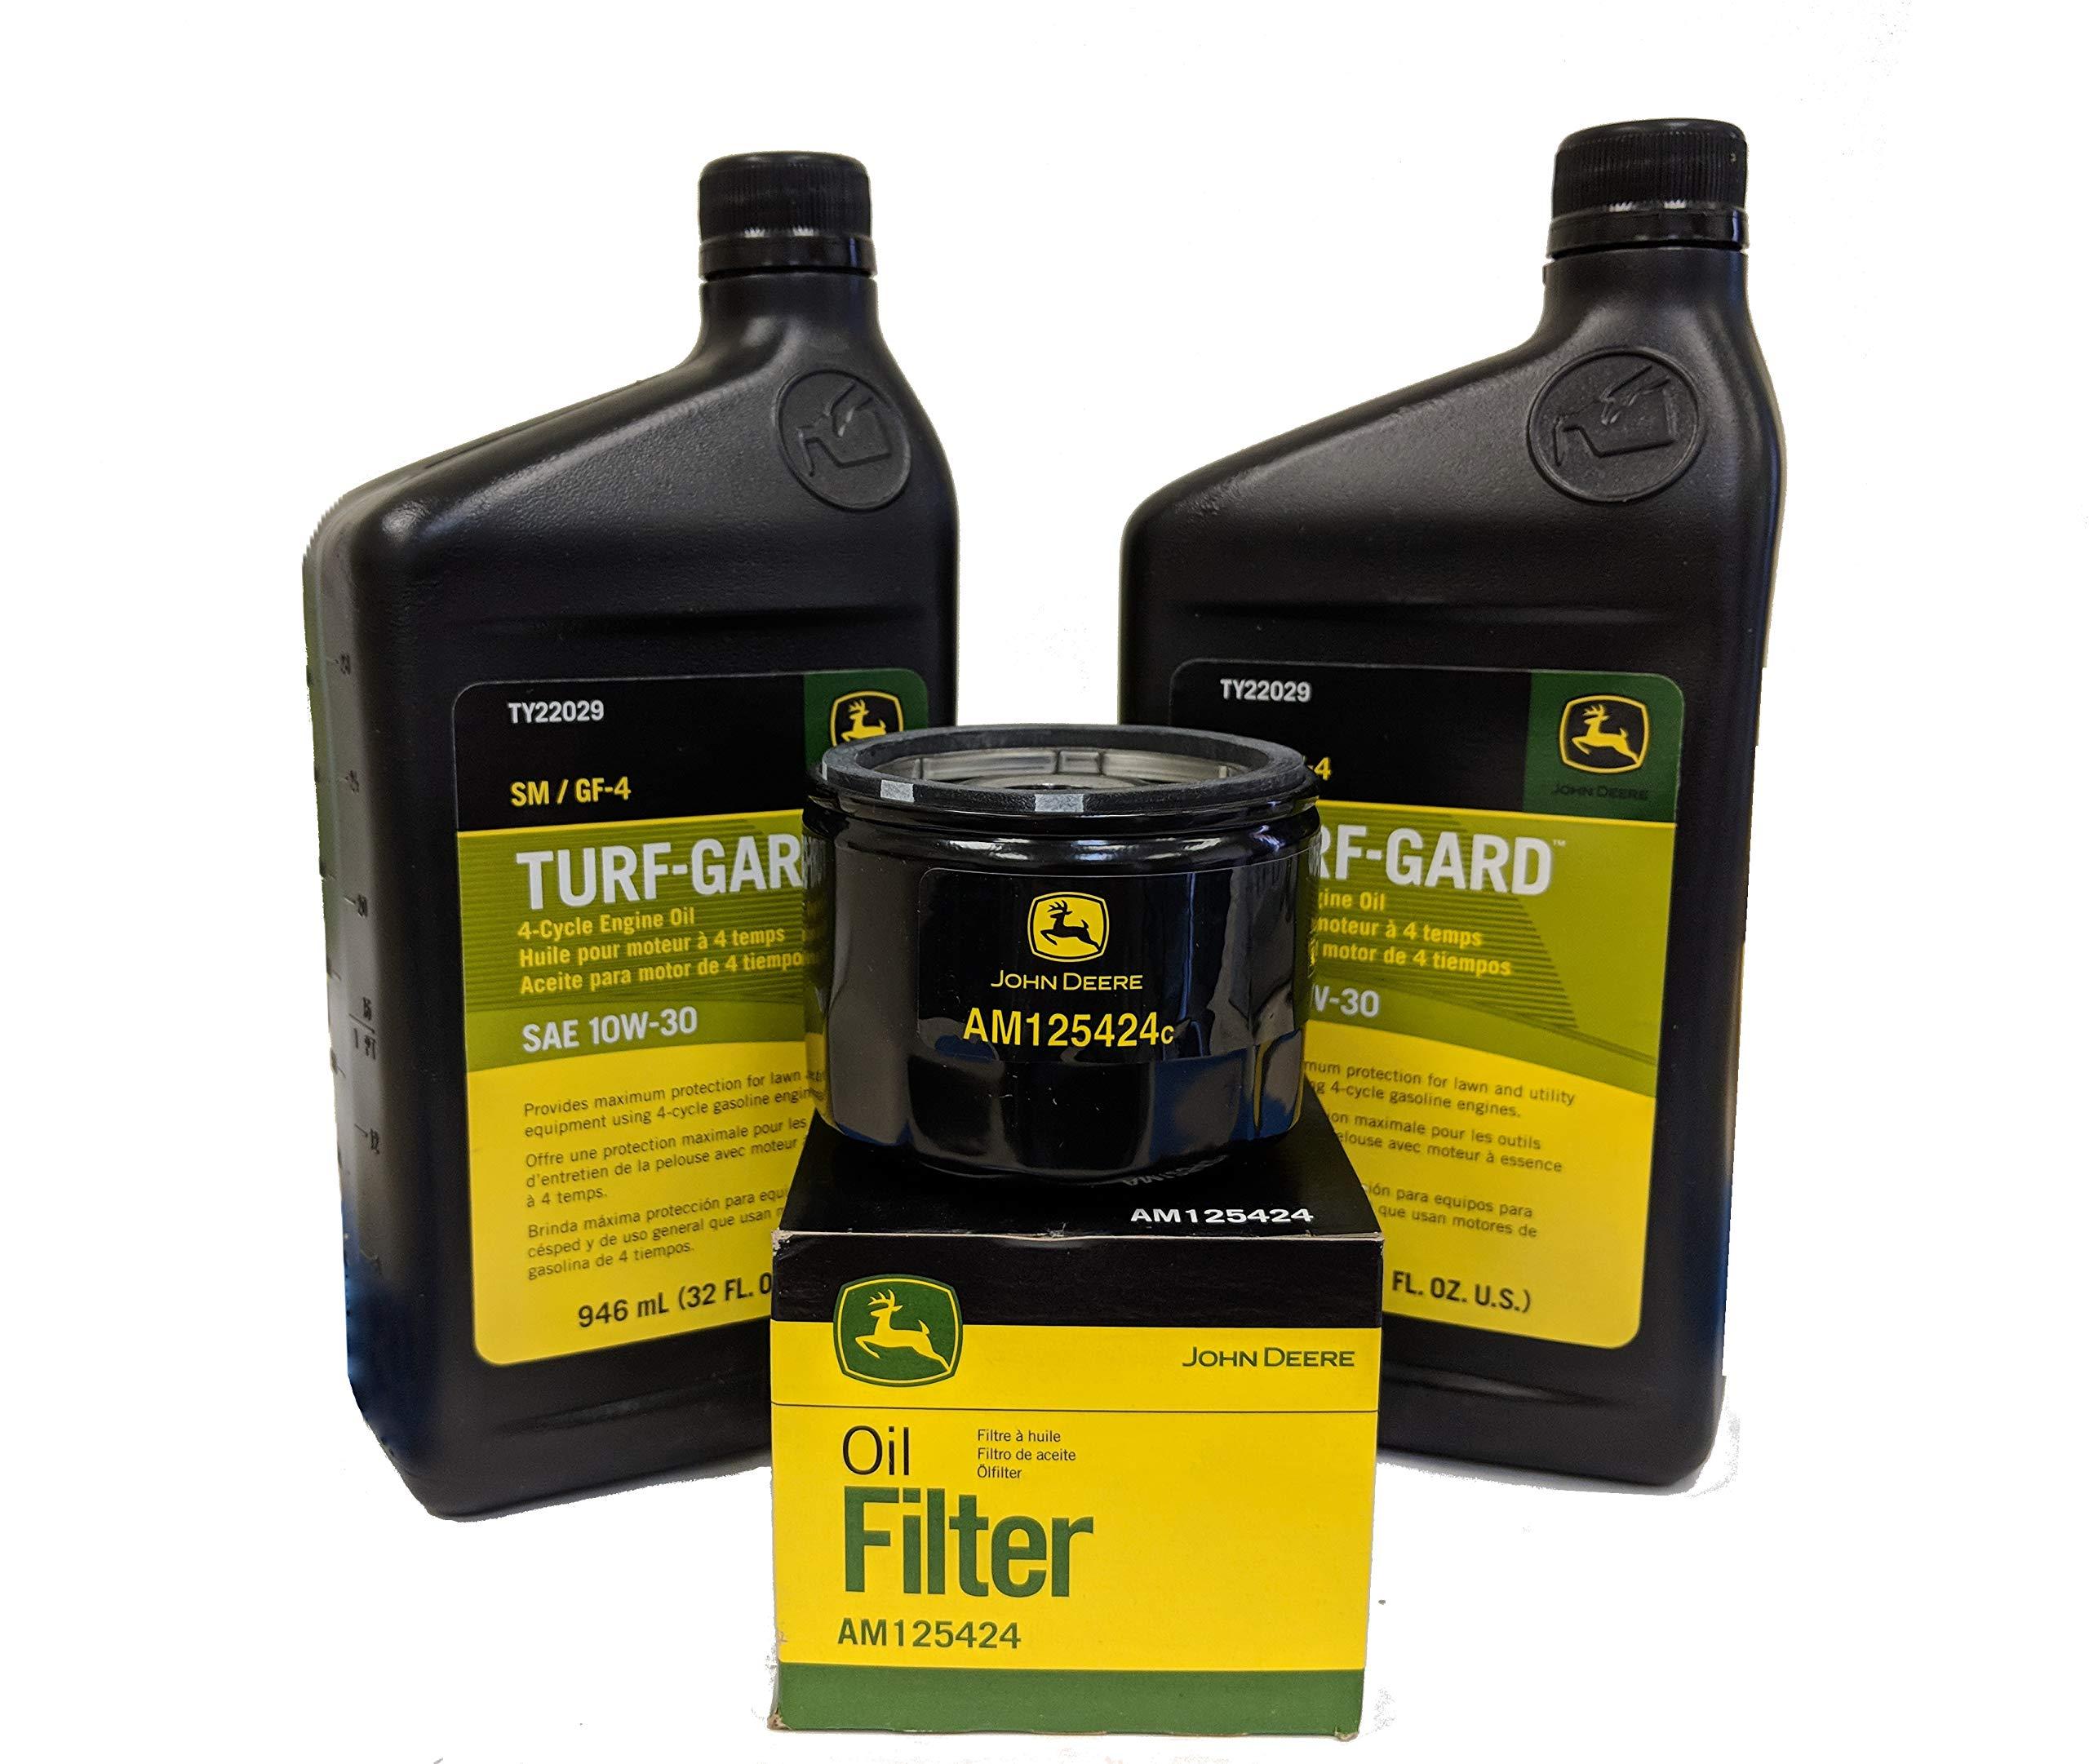 2 Quarts John Deere Turf-Gard SAE 10W-30 Oil Plus AM125424 Filter. Fits Many Lawn Mowers - Check Description